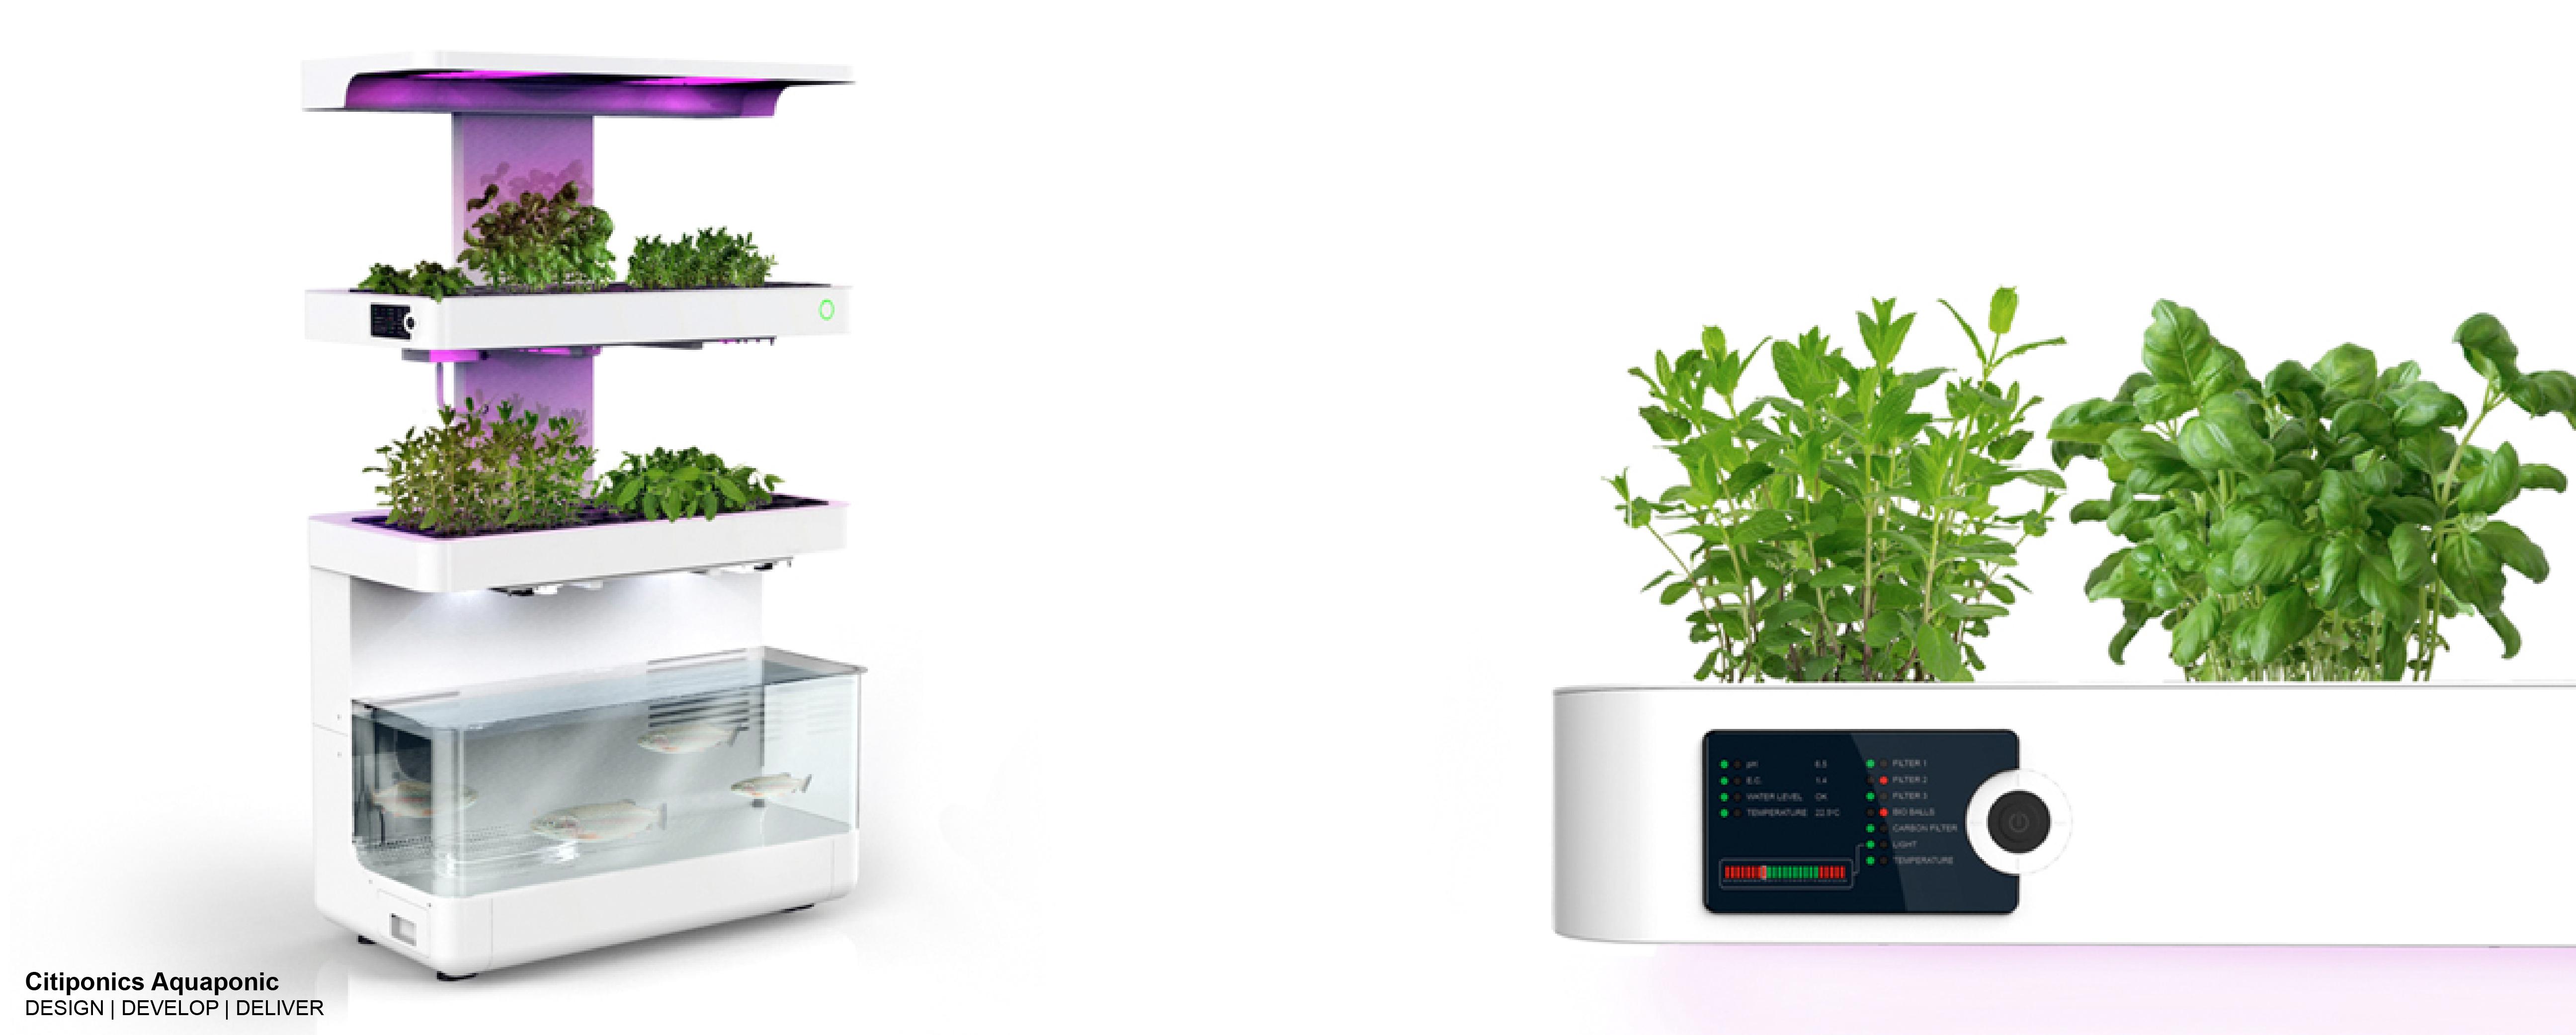 Aquaponic garden system